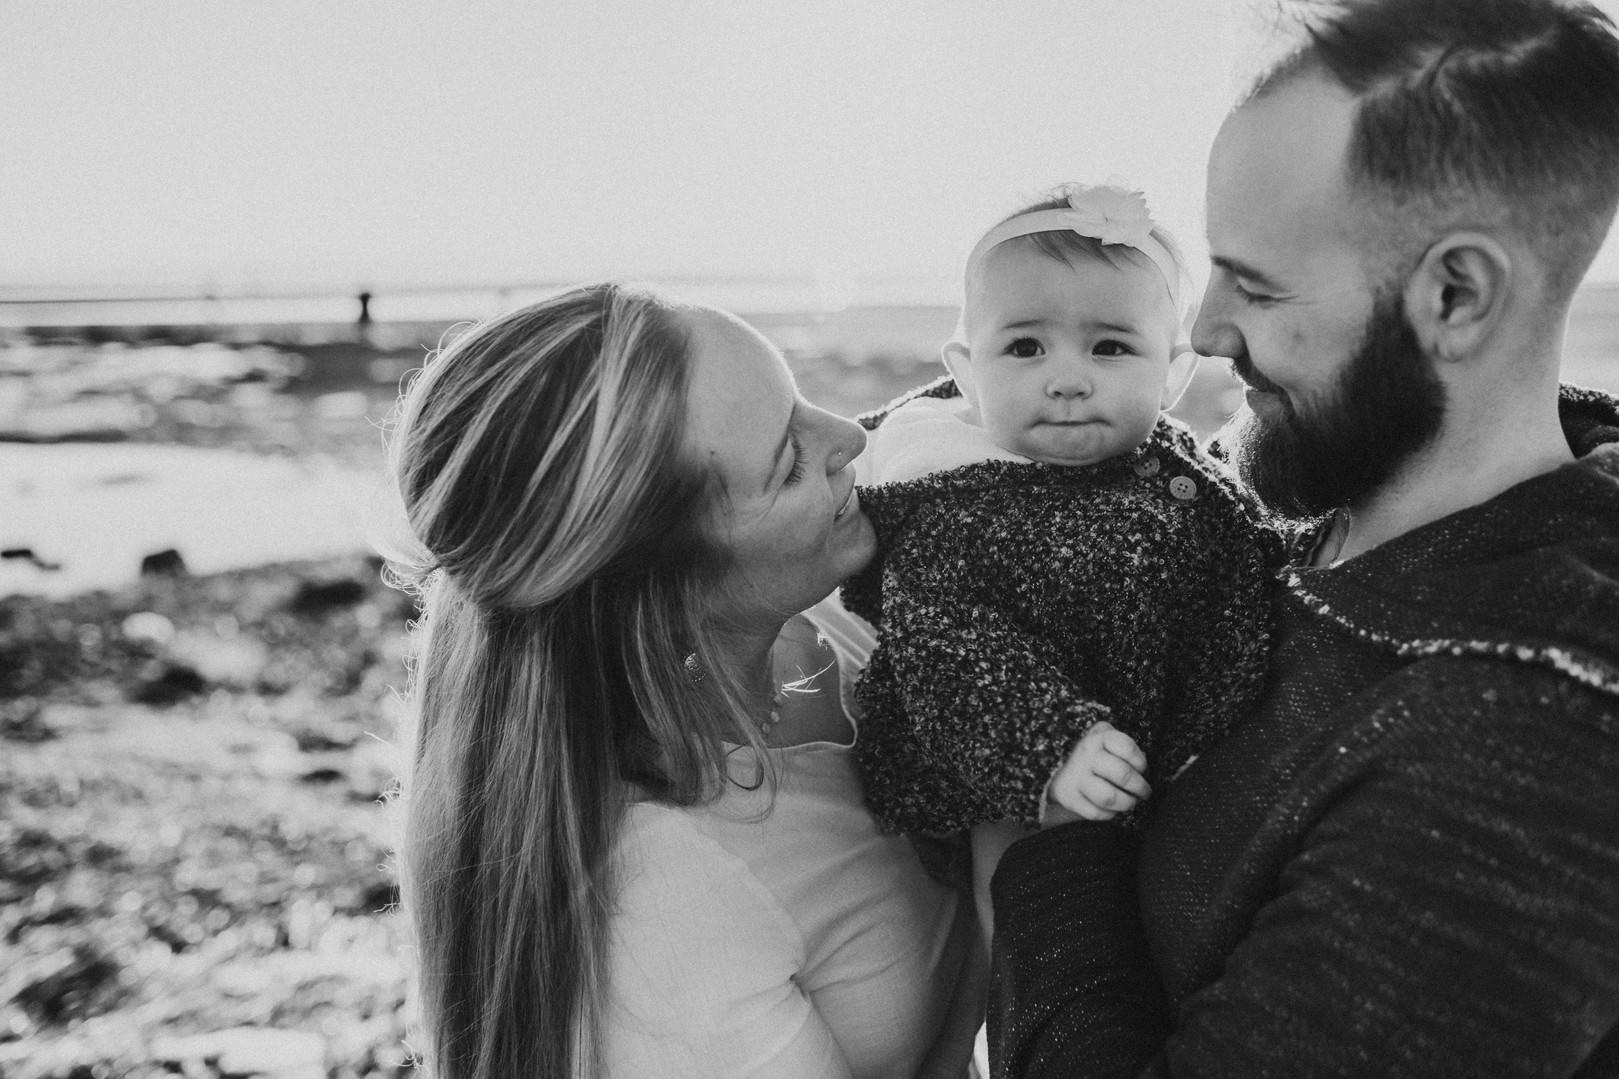 Mawdsley Family _ Dacia vu photography-5